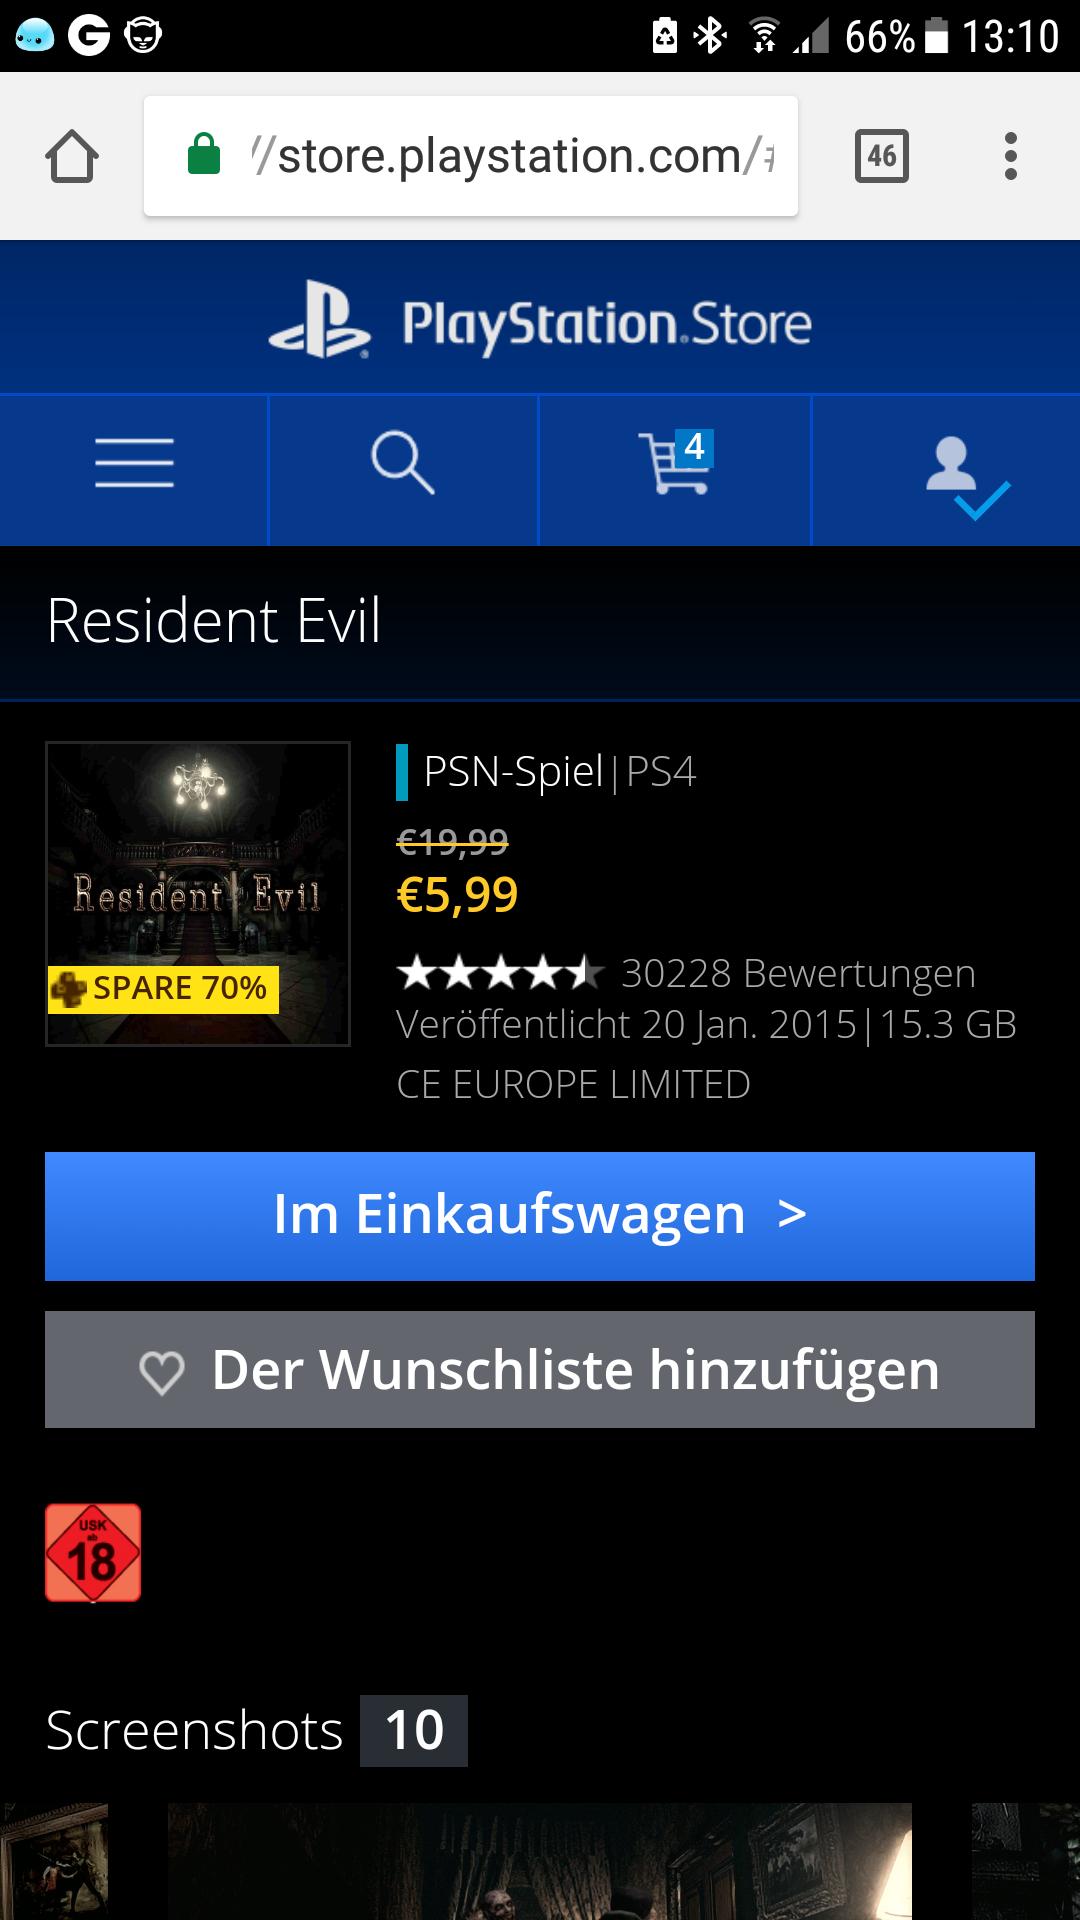 Resident Evil PSN Store Playstation 4